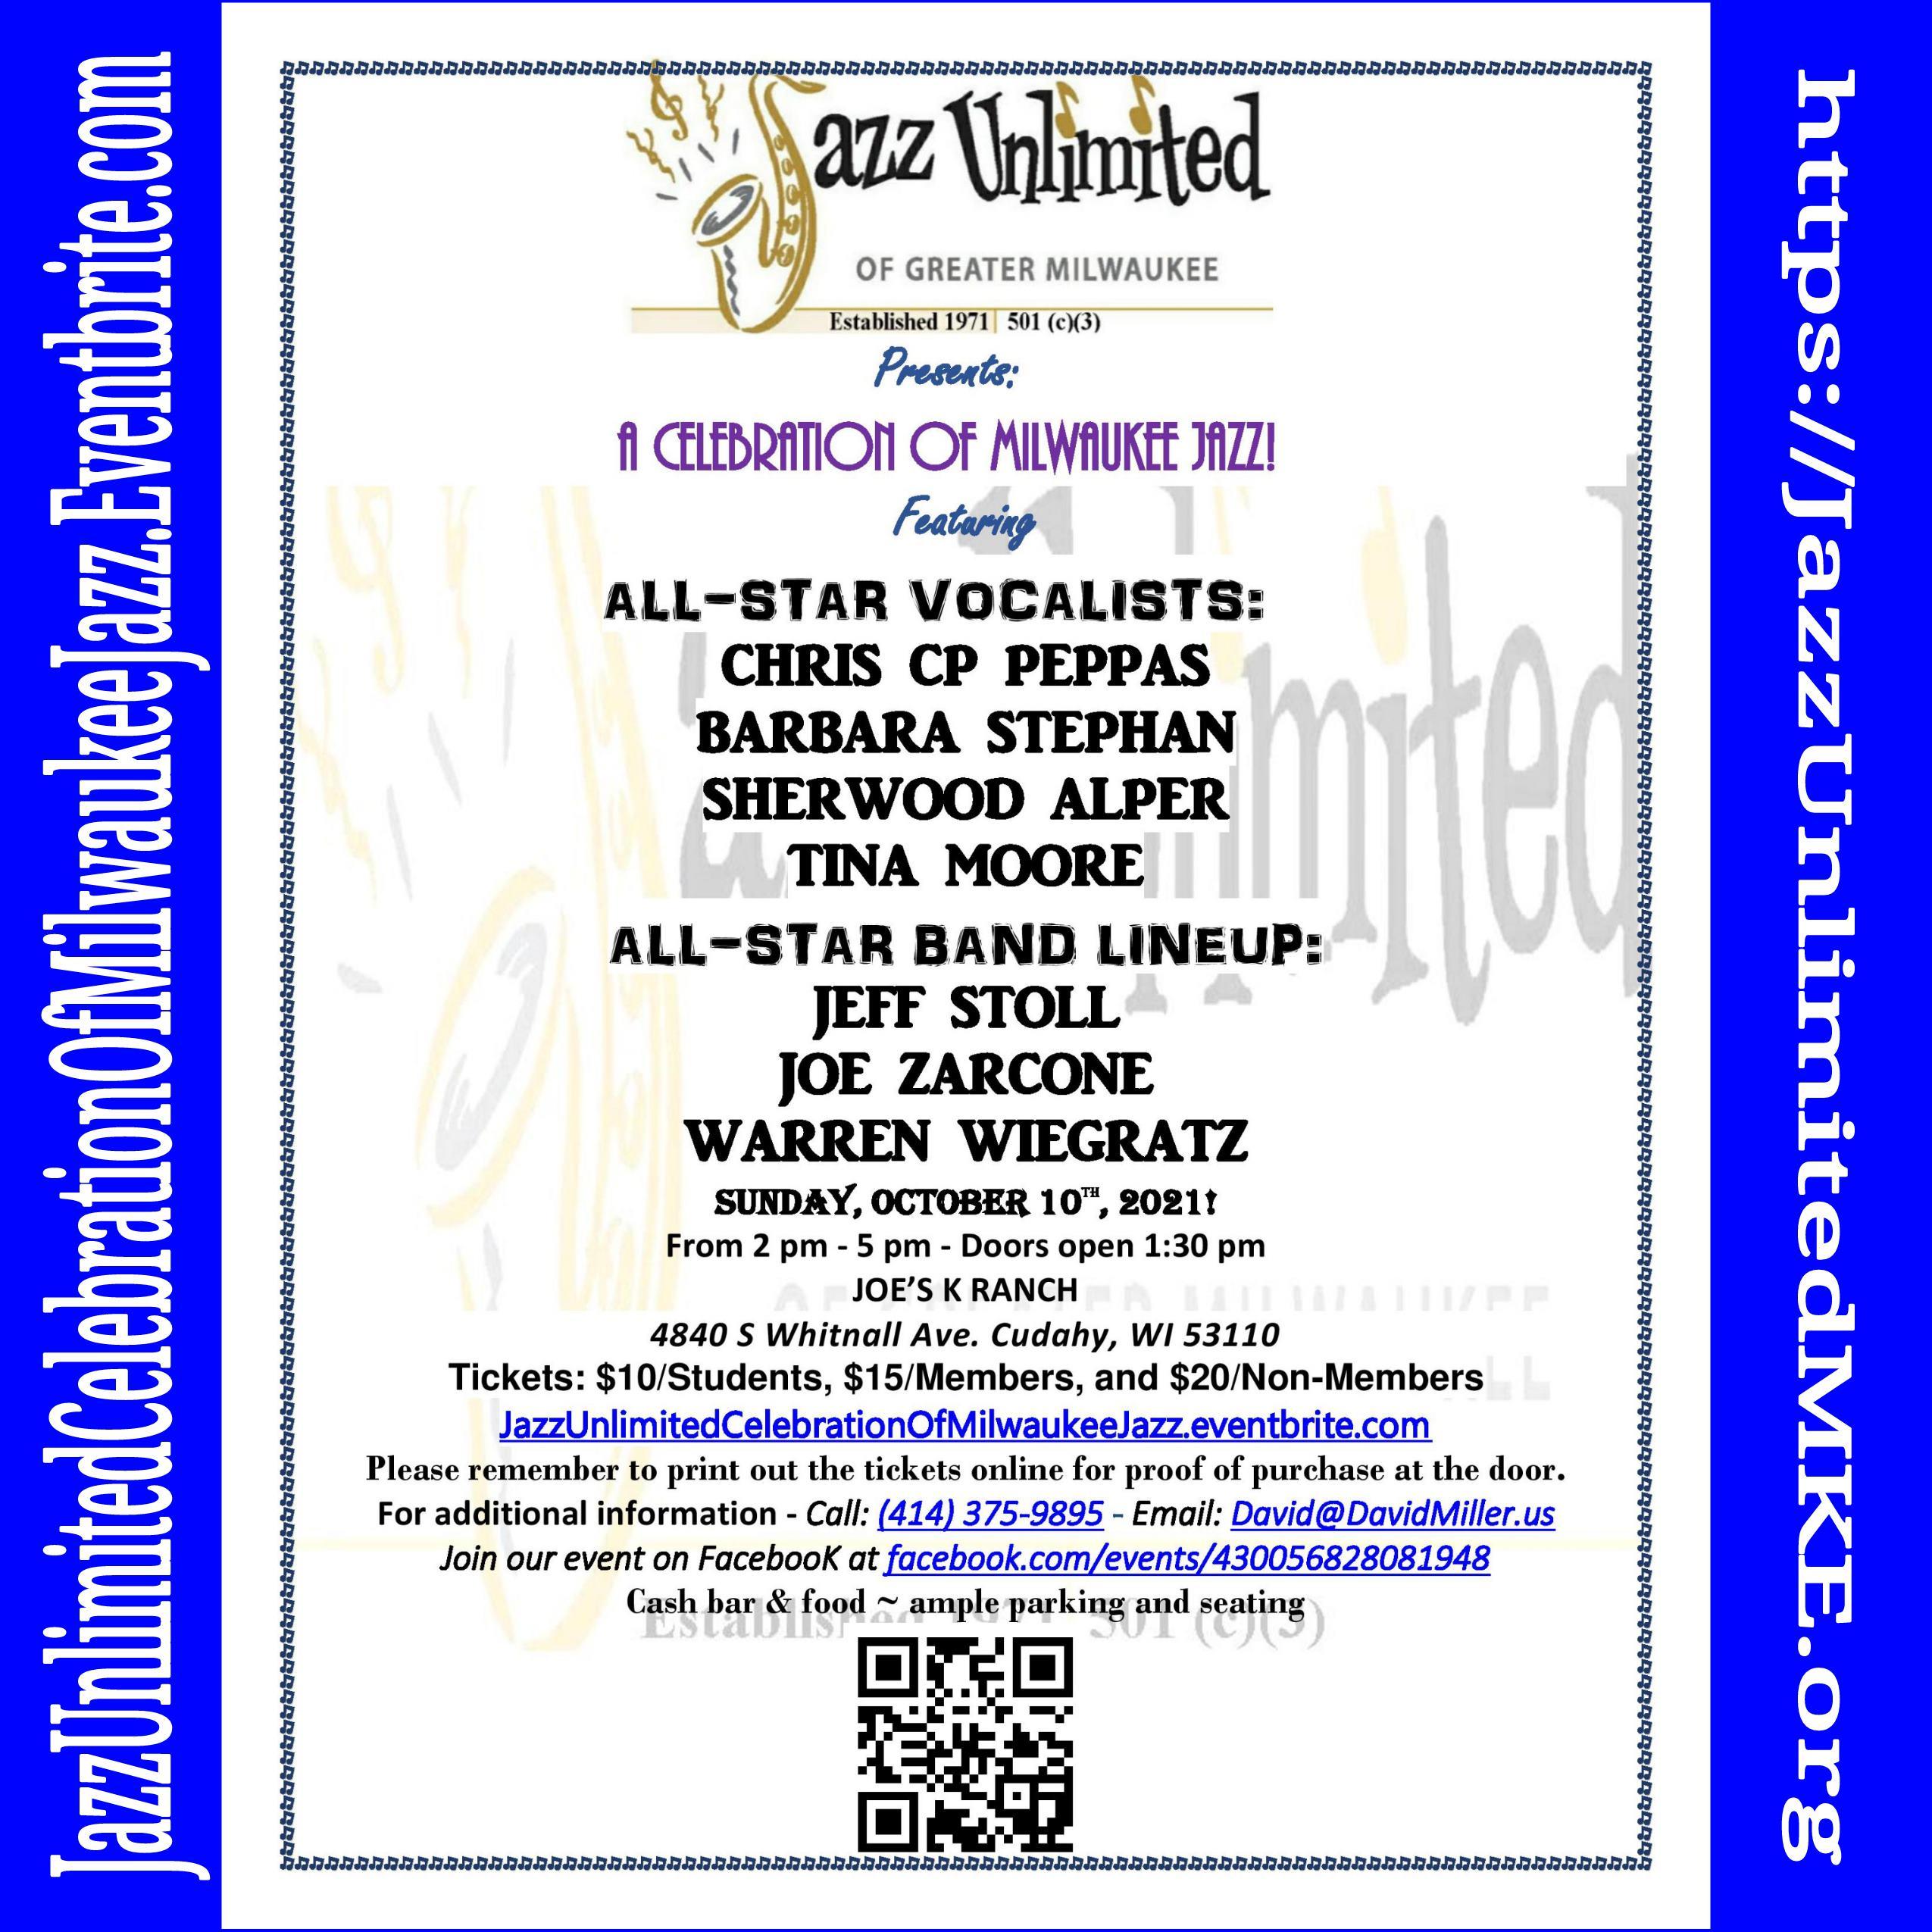 Jazz Unlimited Celebration Of Milwaukee Jazz 2021